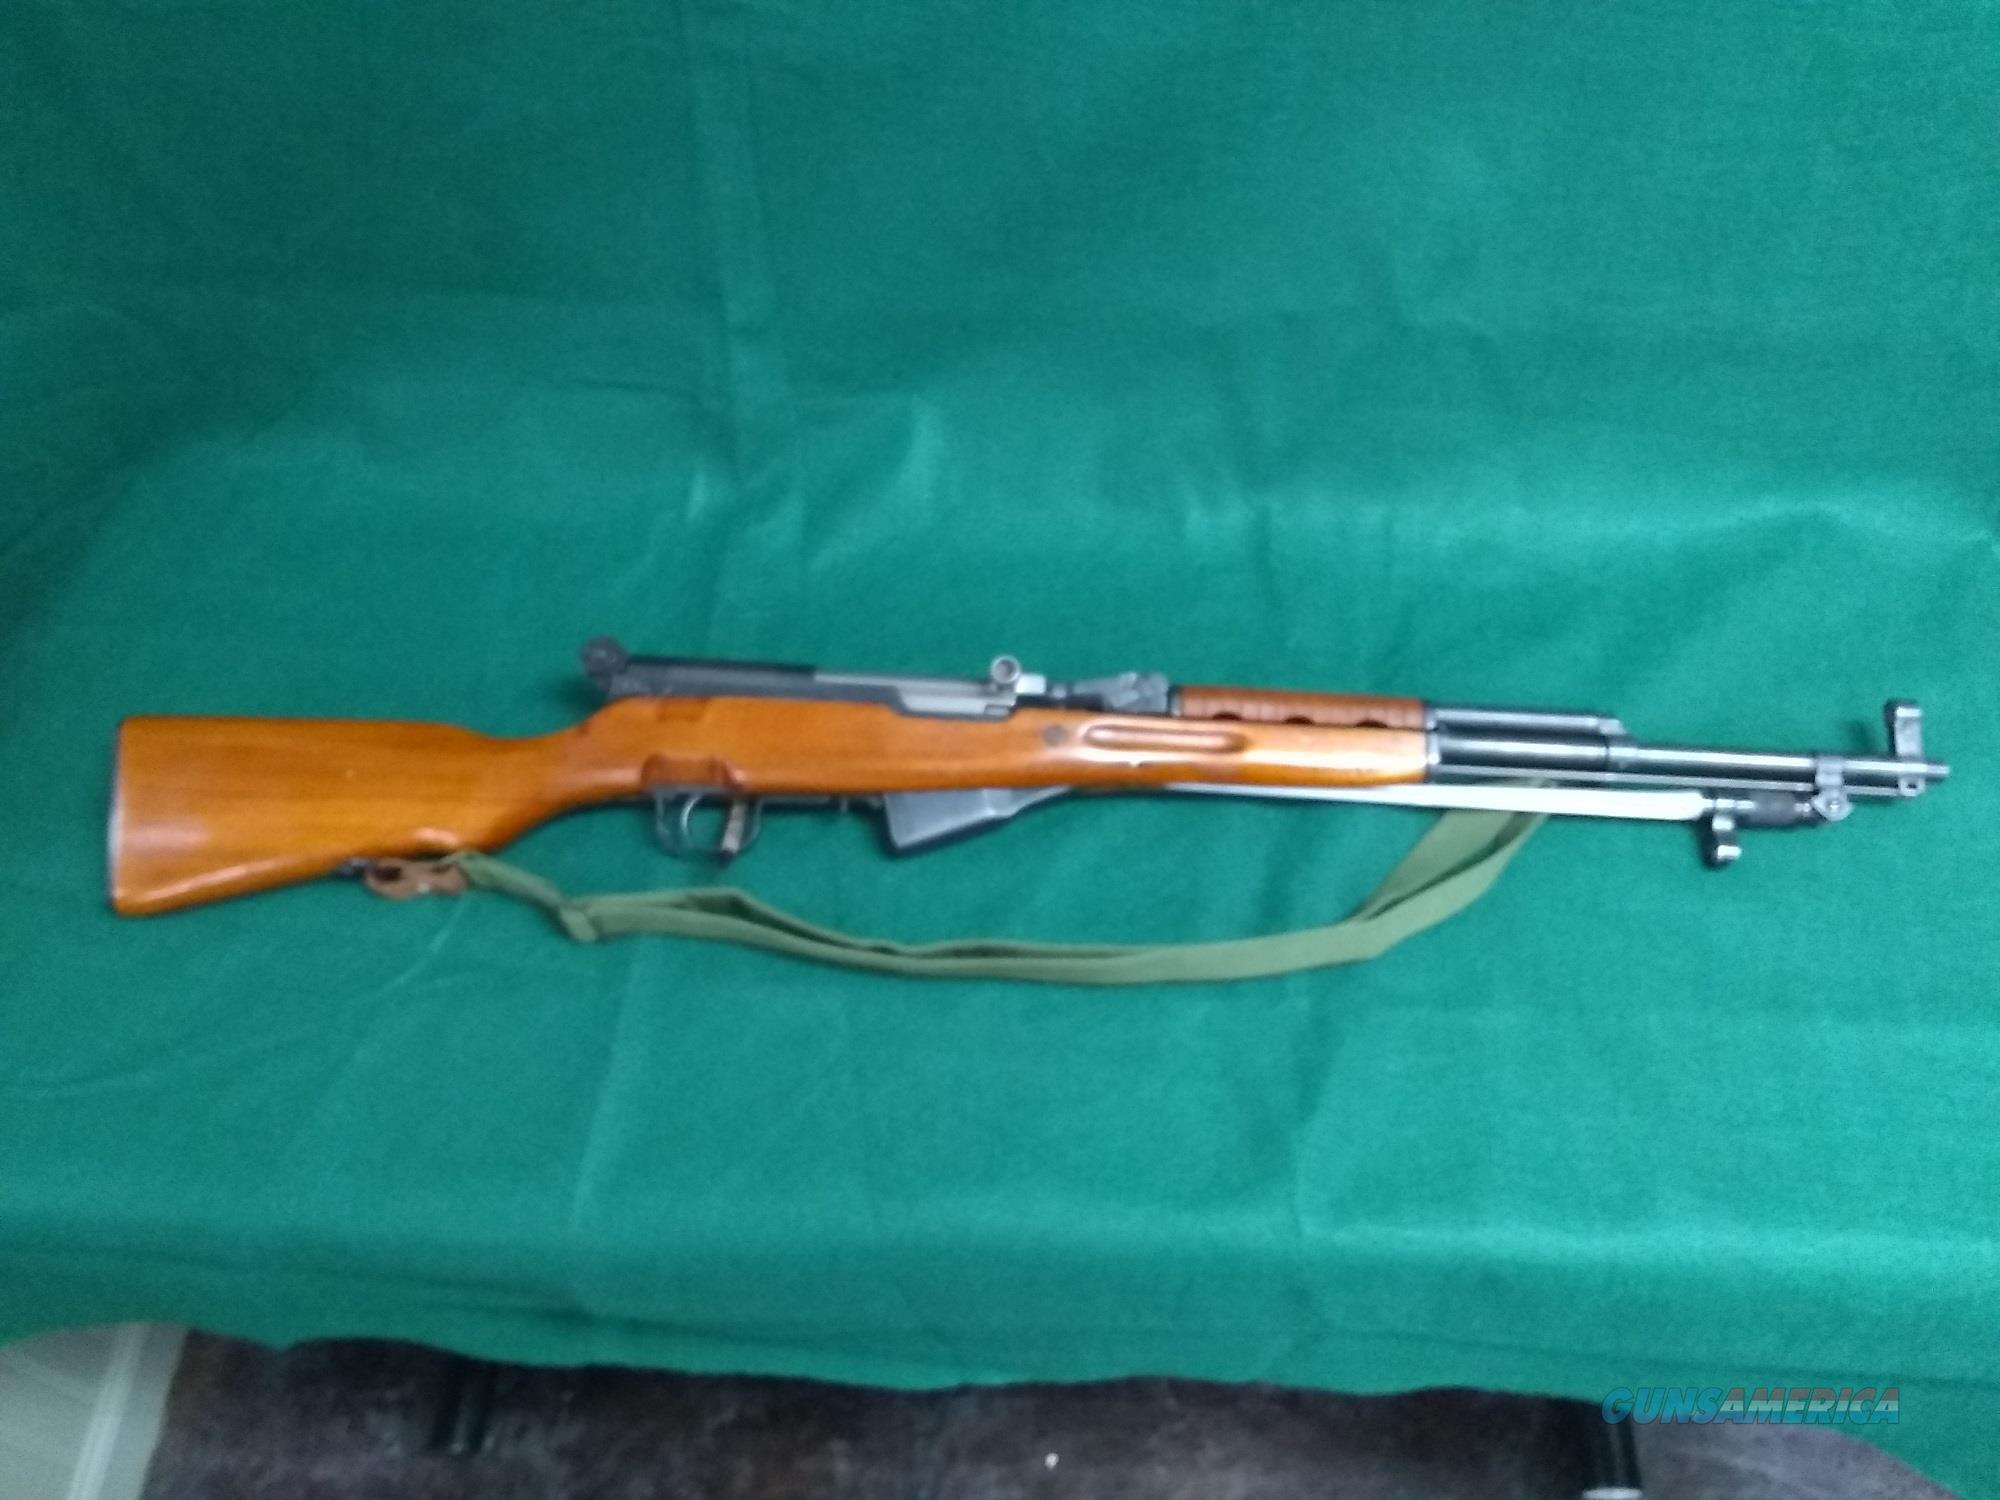 1979 Norinco SKS - Matching Numbers - Tech Sights - 7.62X39  Guns > Rifles > Norinco Rifles